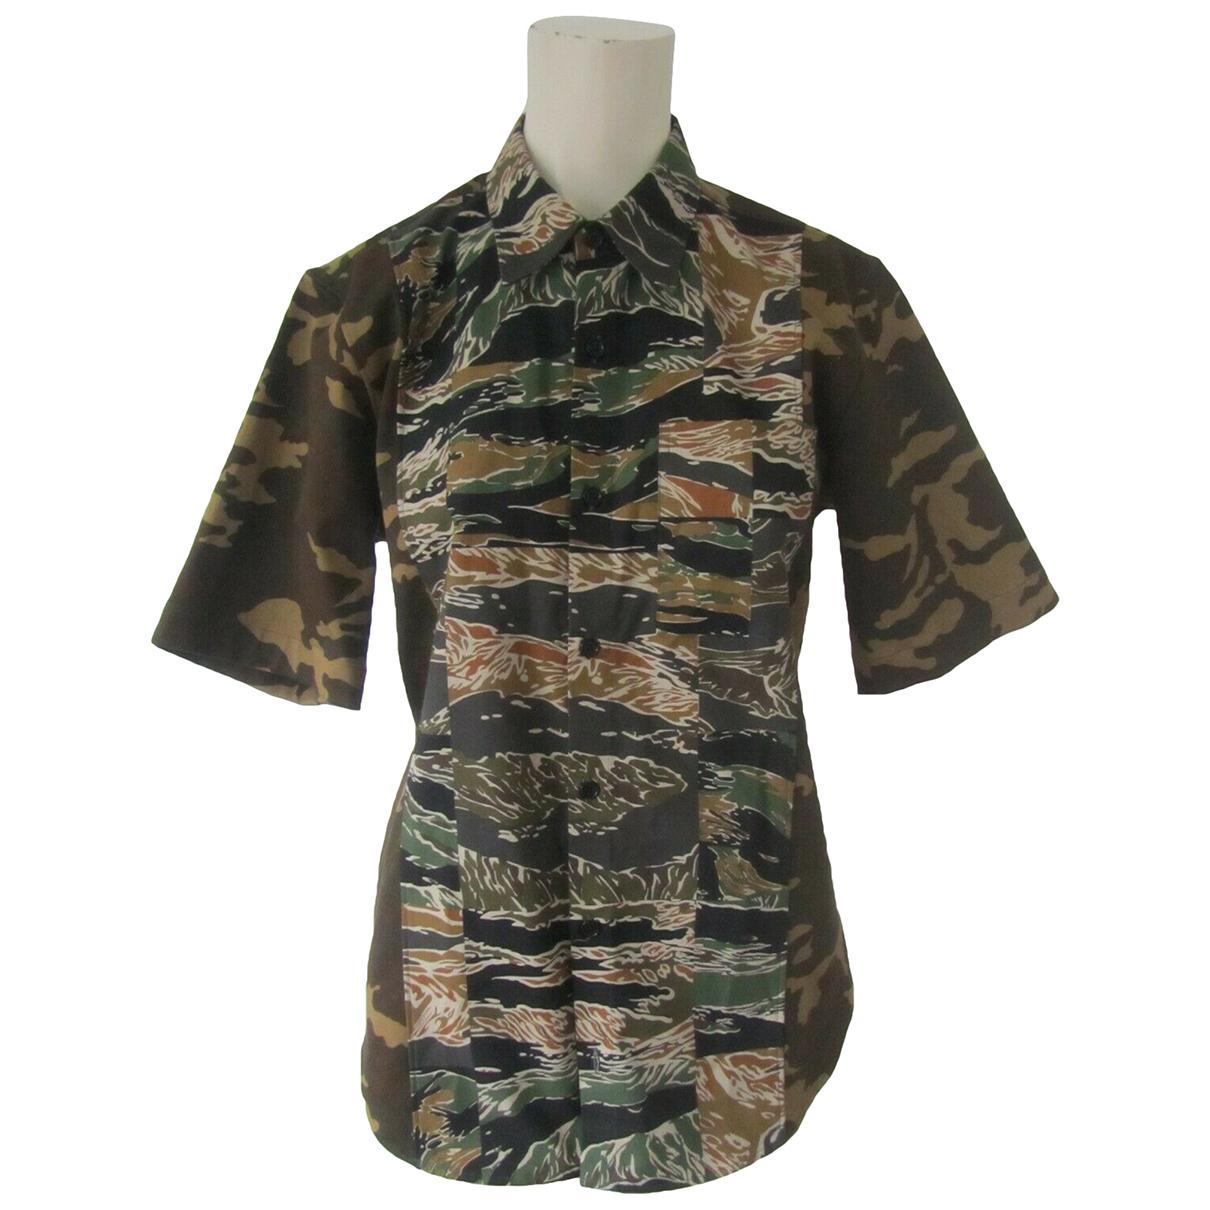 Dries Van Noten \N Multicolour Cotton Shirts for Men S International